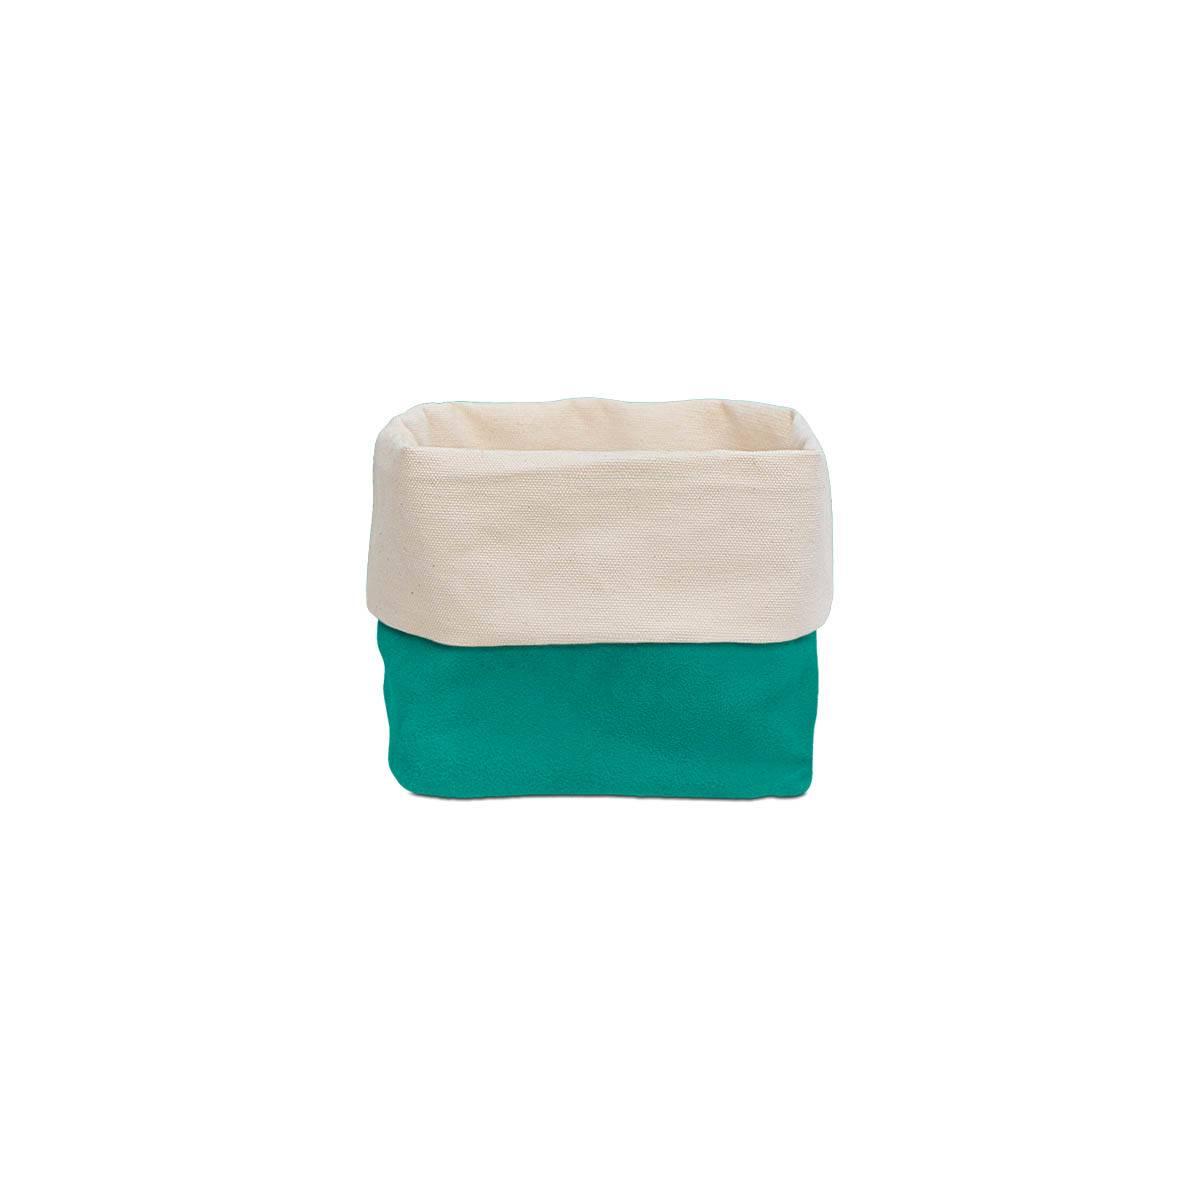 Porta Treco • Futon Company ® #028377 1200x1200 Acessorios Banheiro Moema